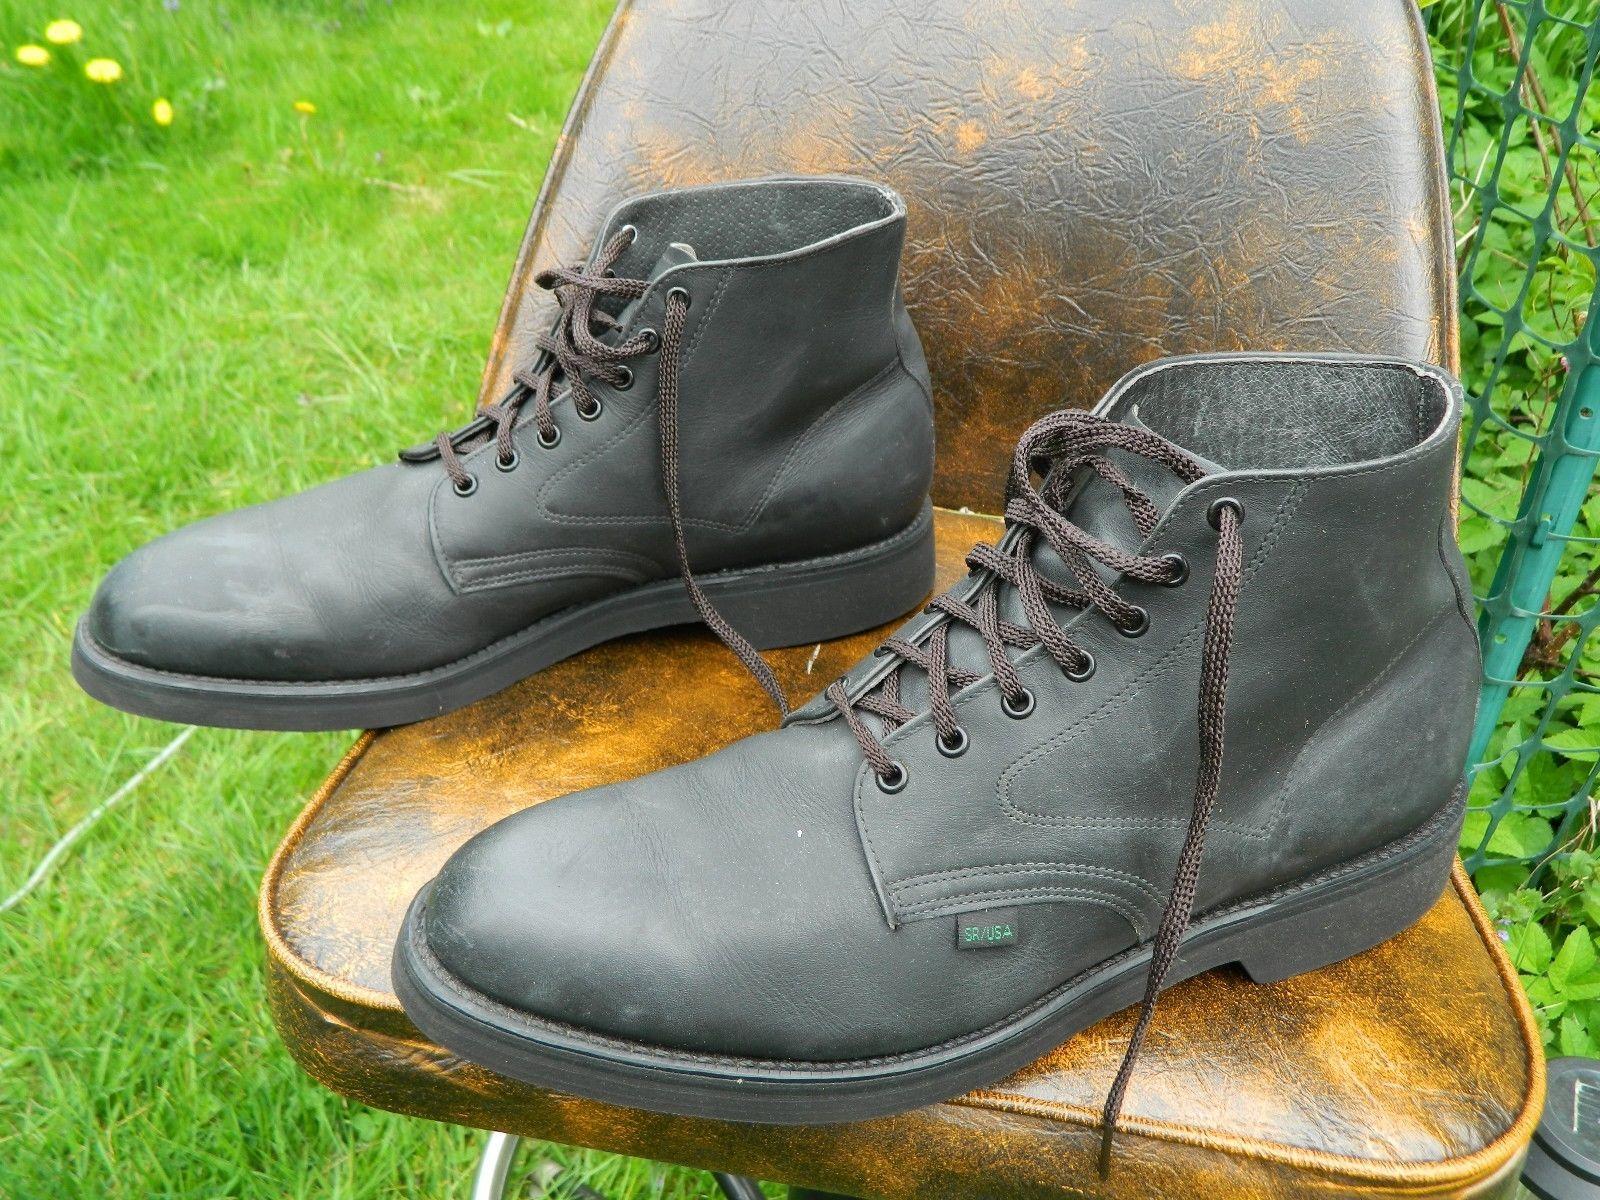 Details About Quot Work America Quot Usps 6 Quot Work Shoes Size 12